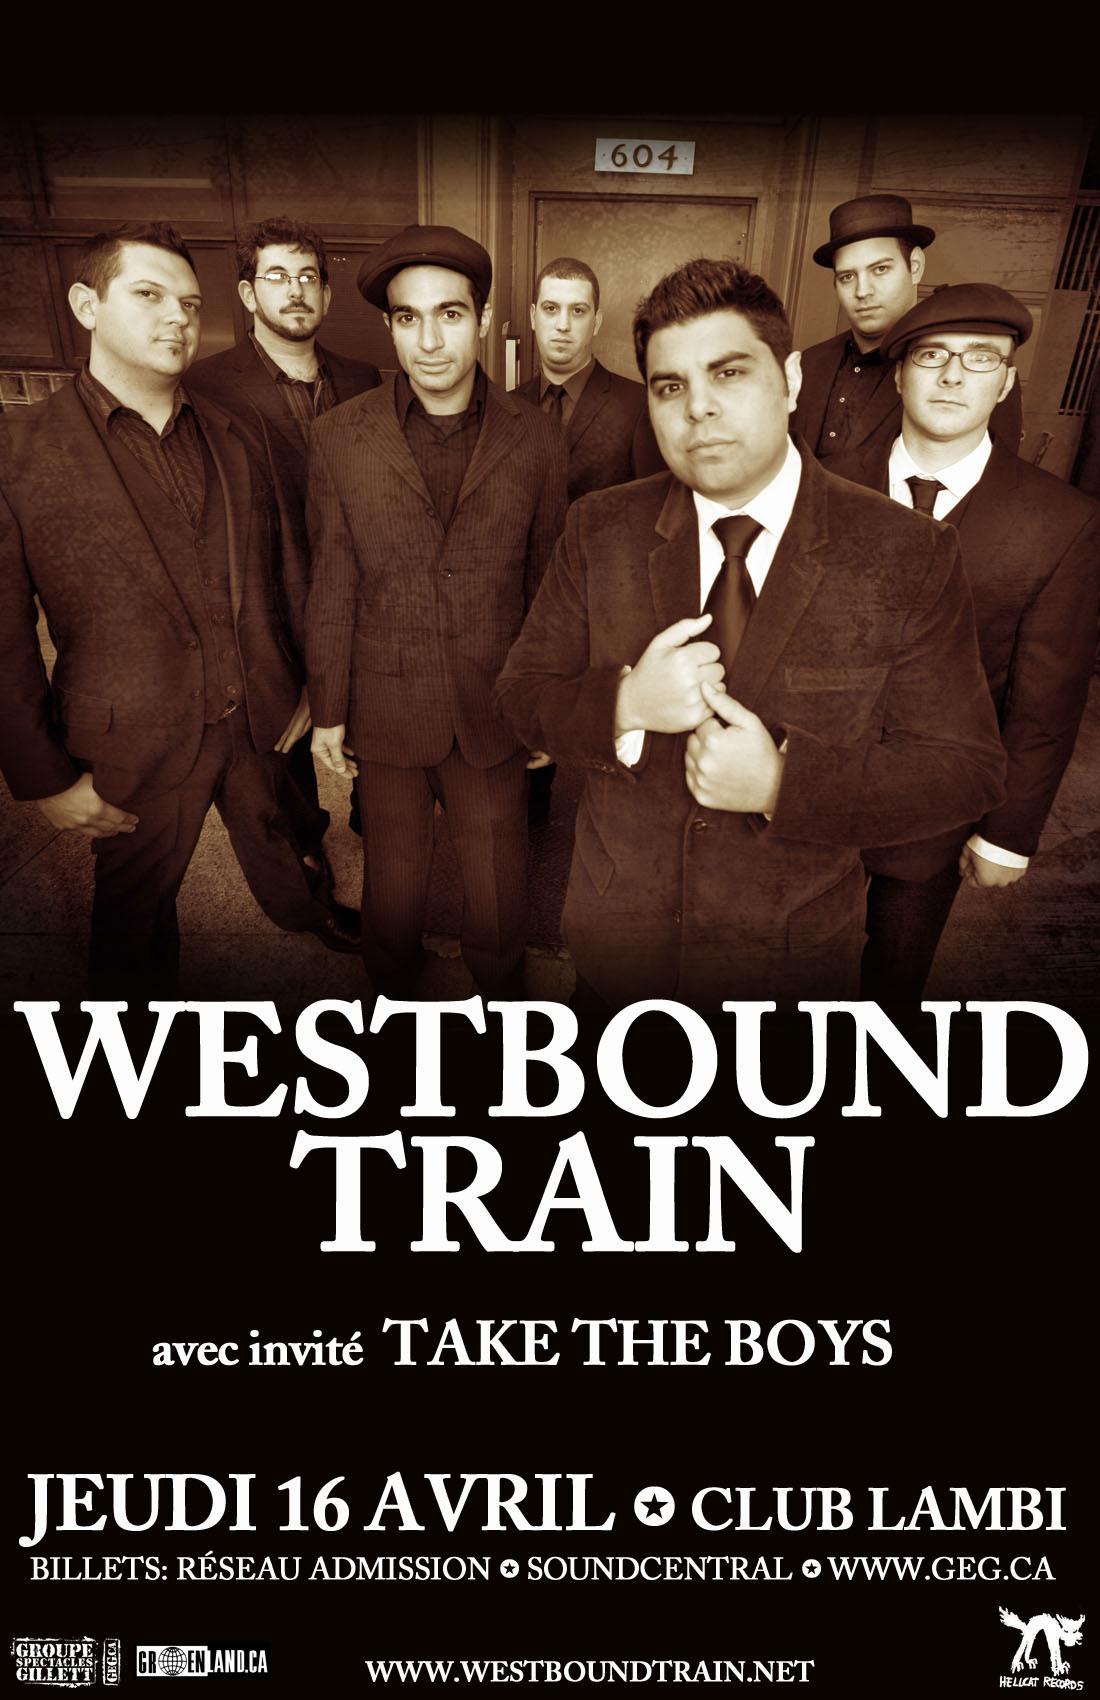 WestboundTrain_poster(April09)